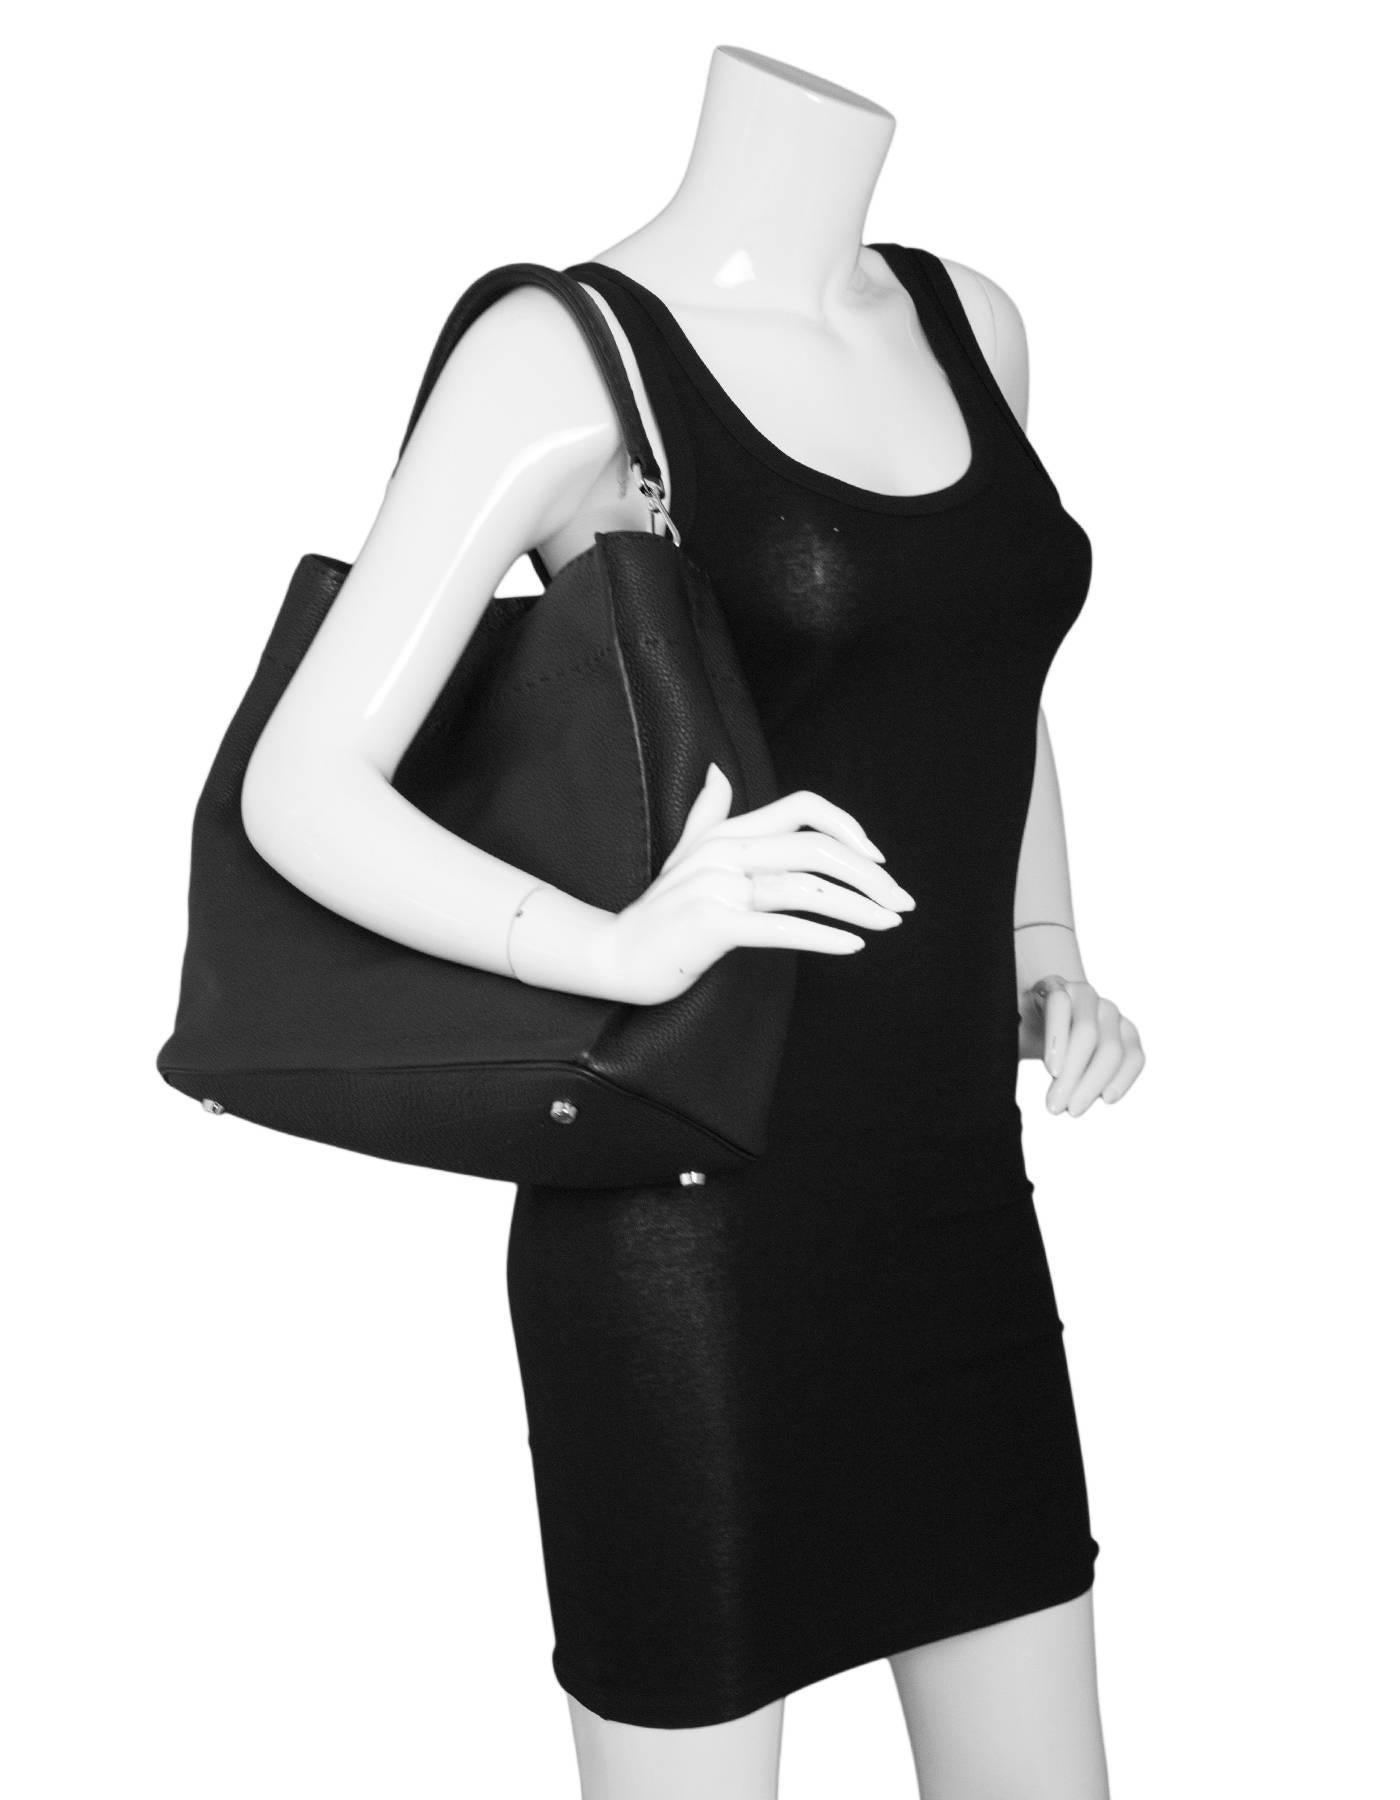 Fendi Black Selleria Leather Anna Hobo Bag W. Strap Rt. $2,950